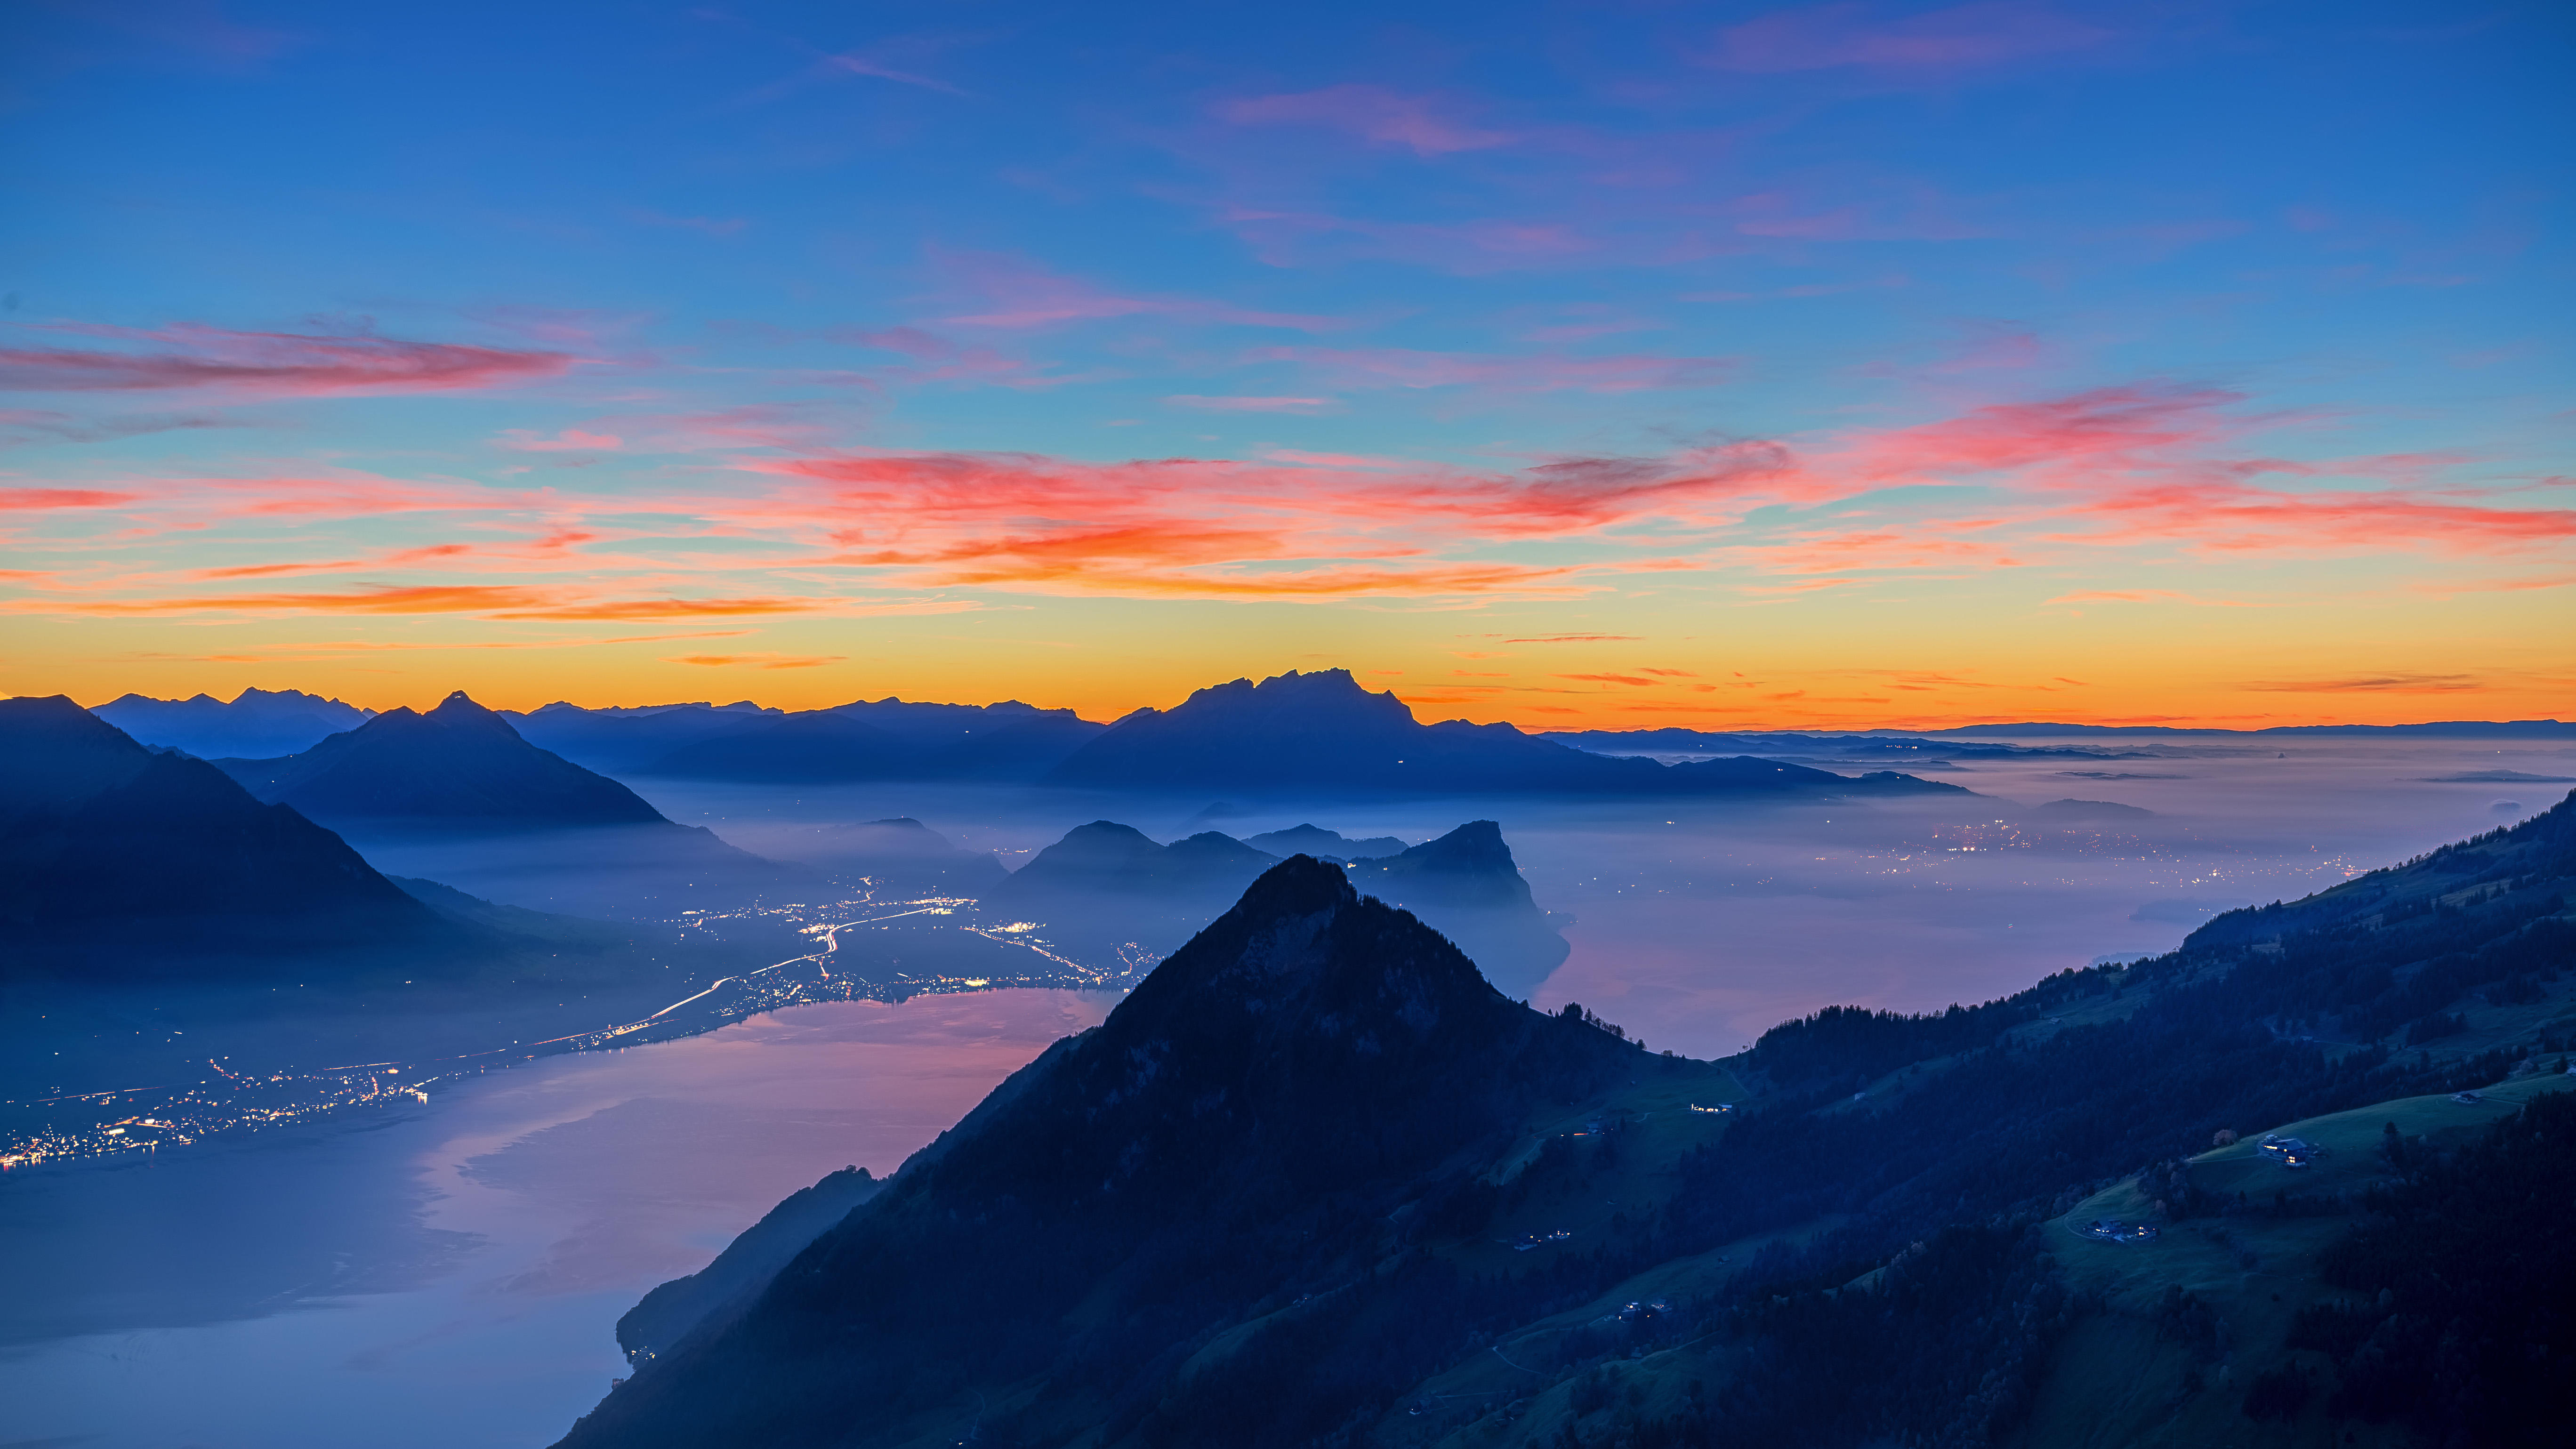 обои Озеро Луцерн, Море тумана, синий час, Туман картинки фото